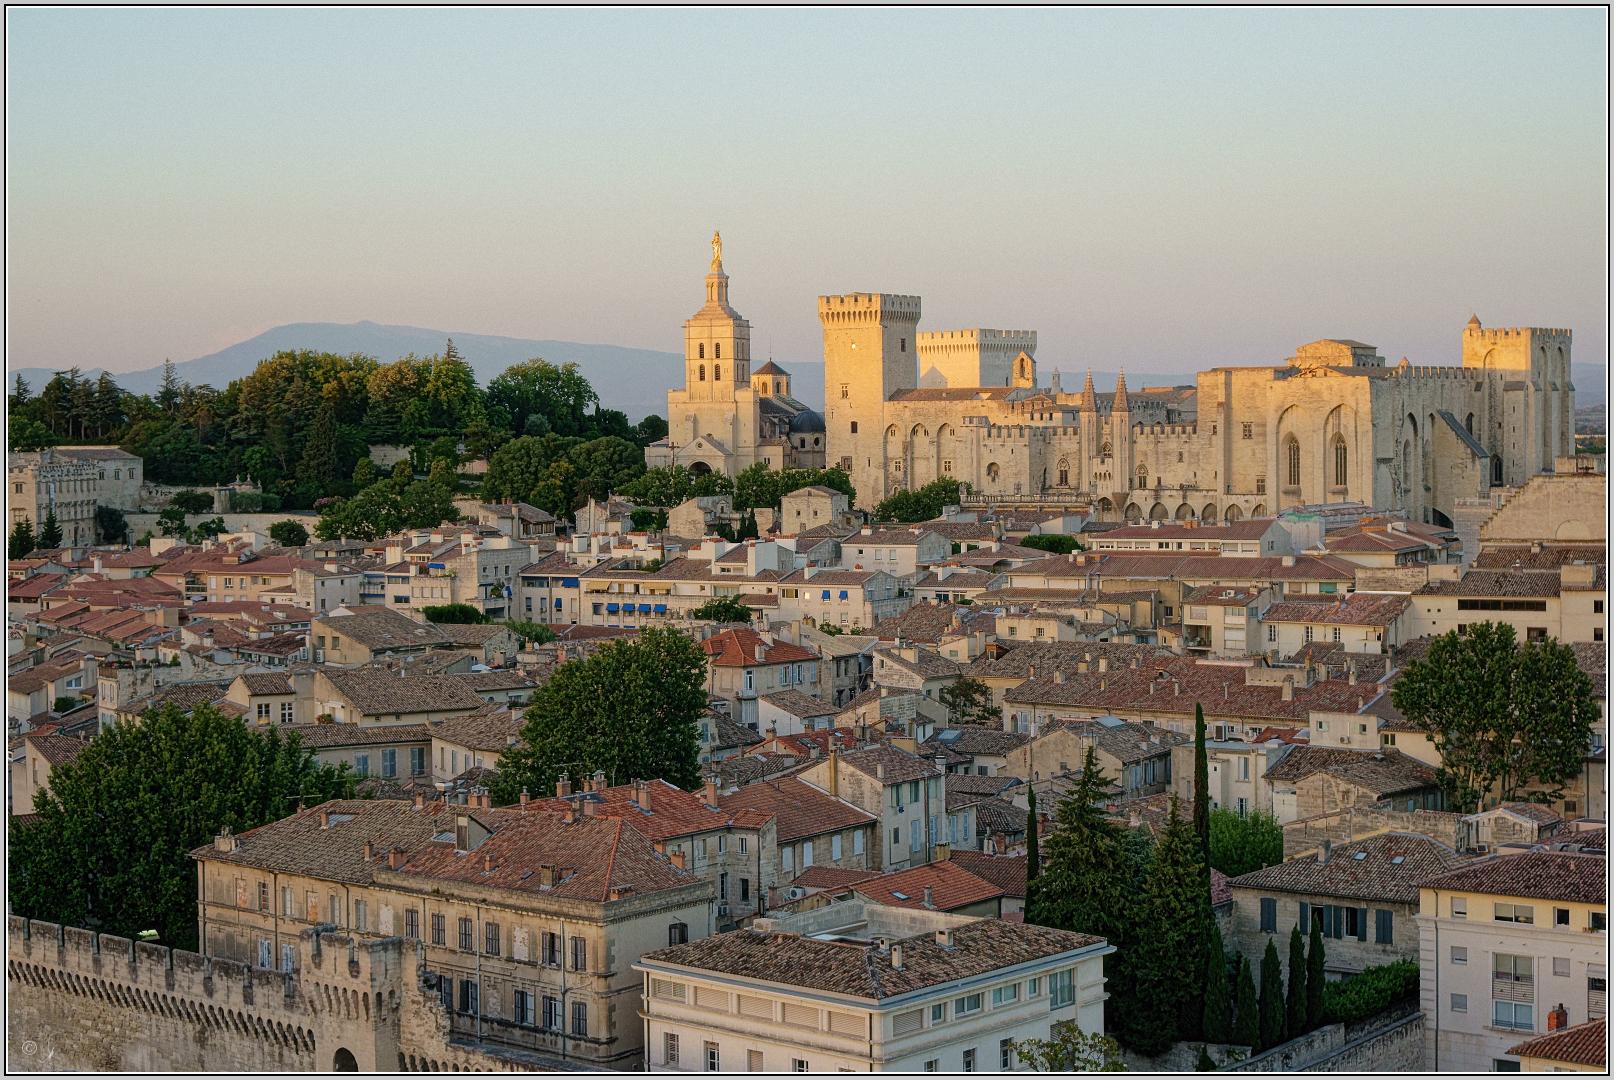 Abendsonne in Avignon